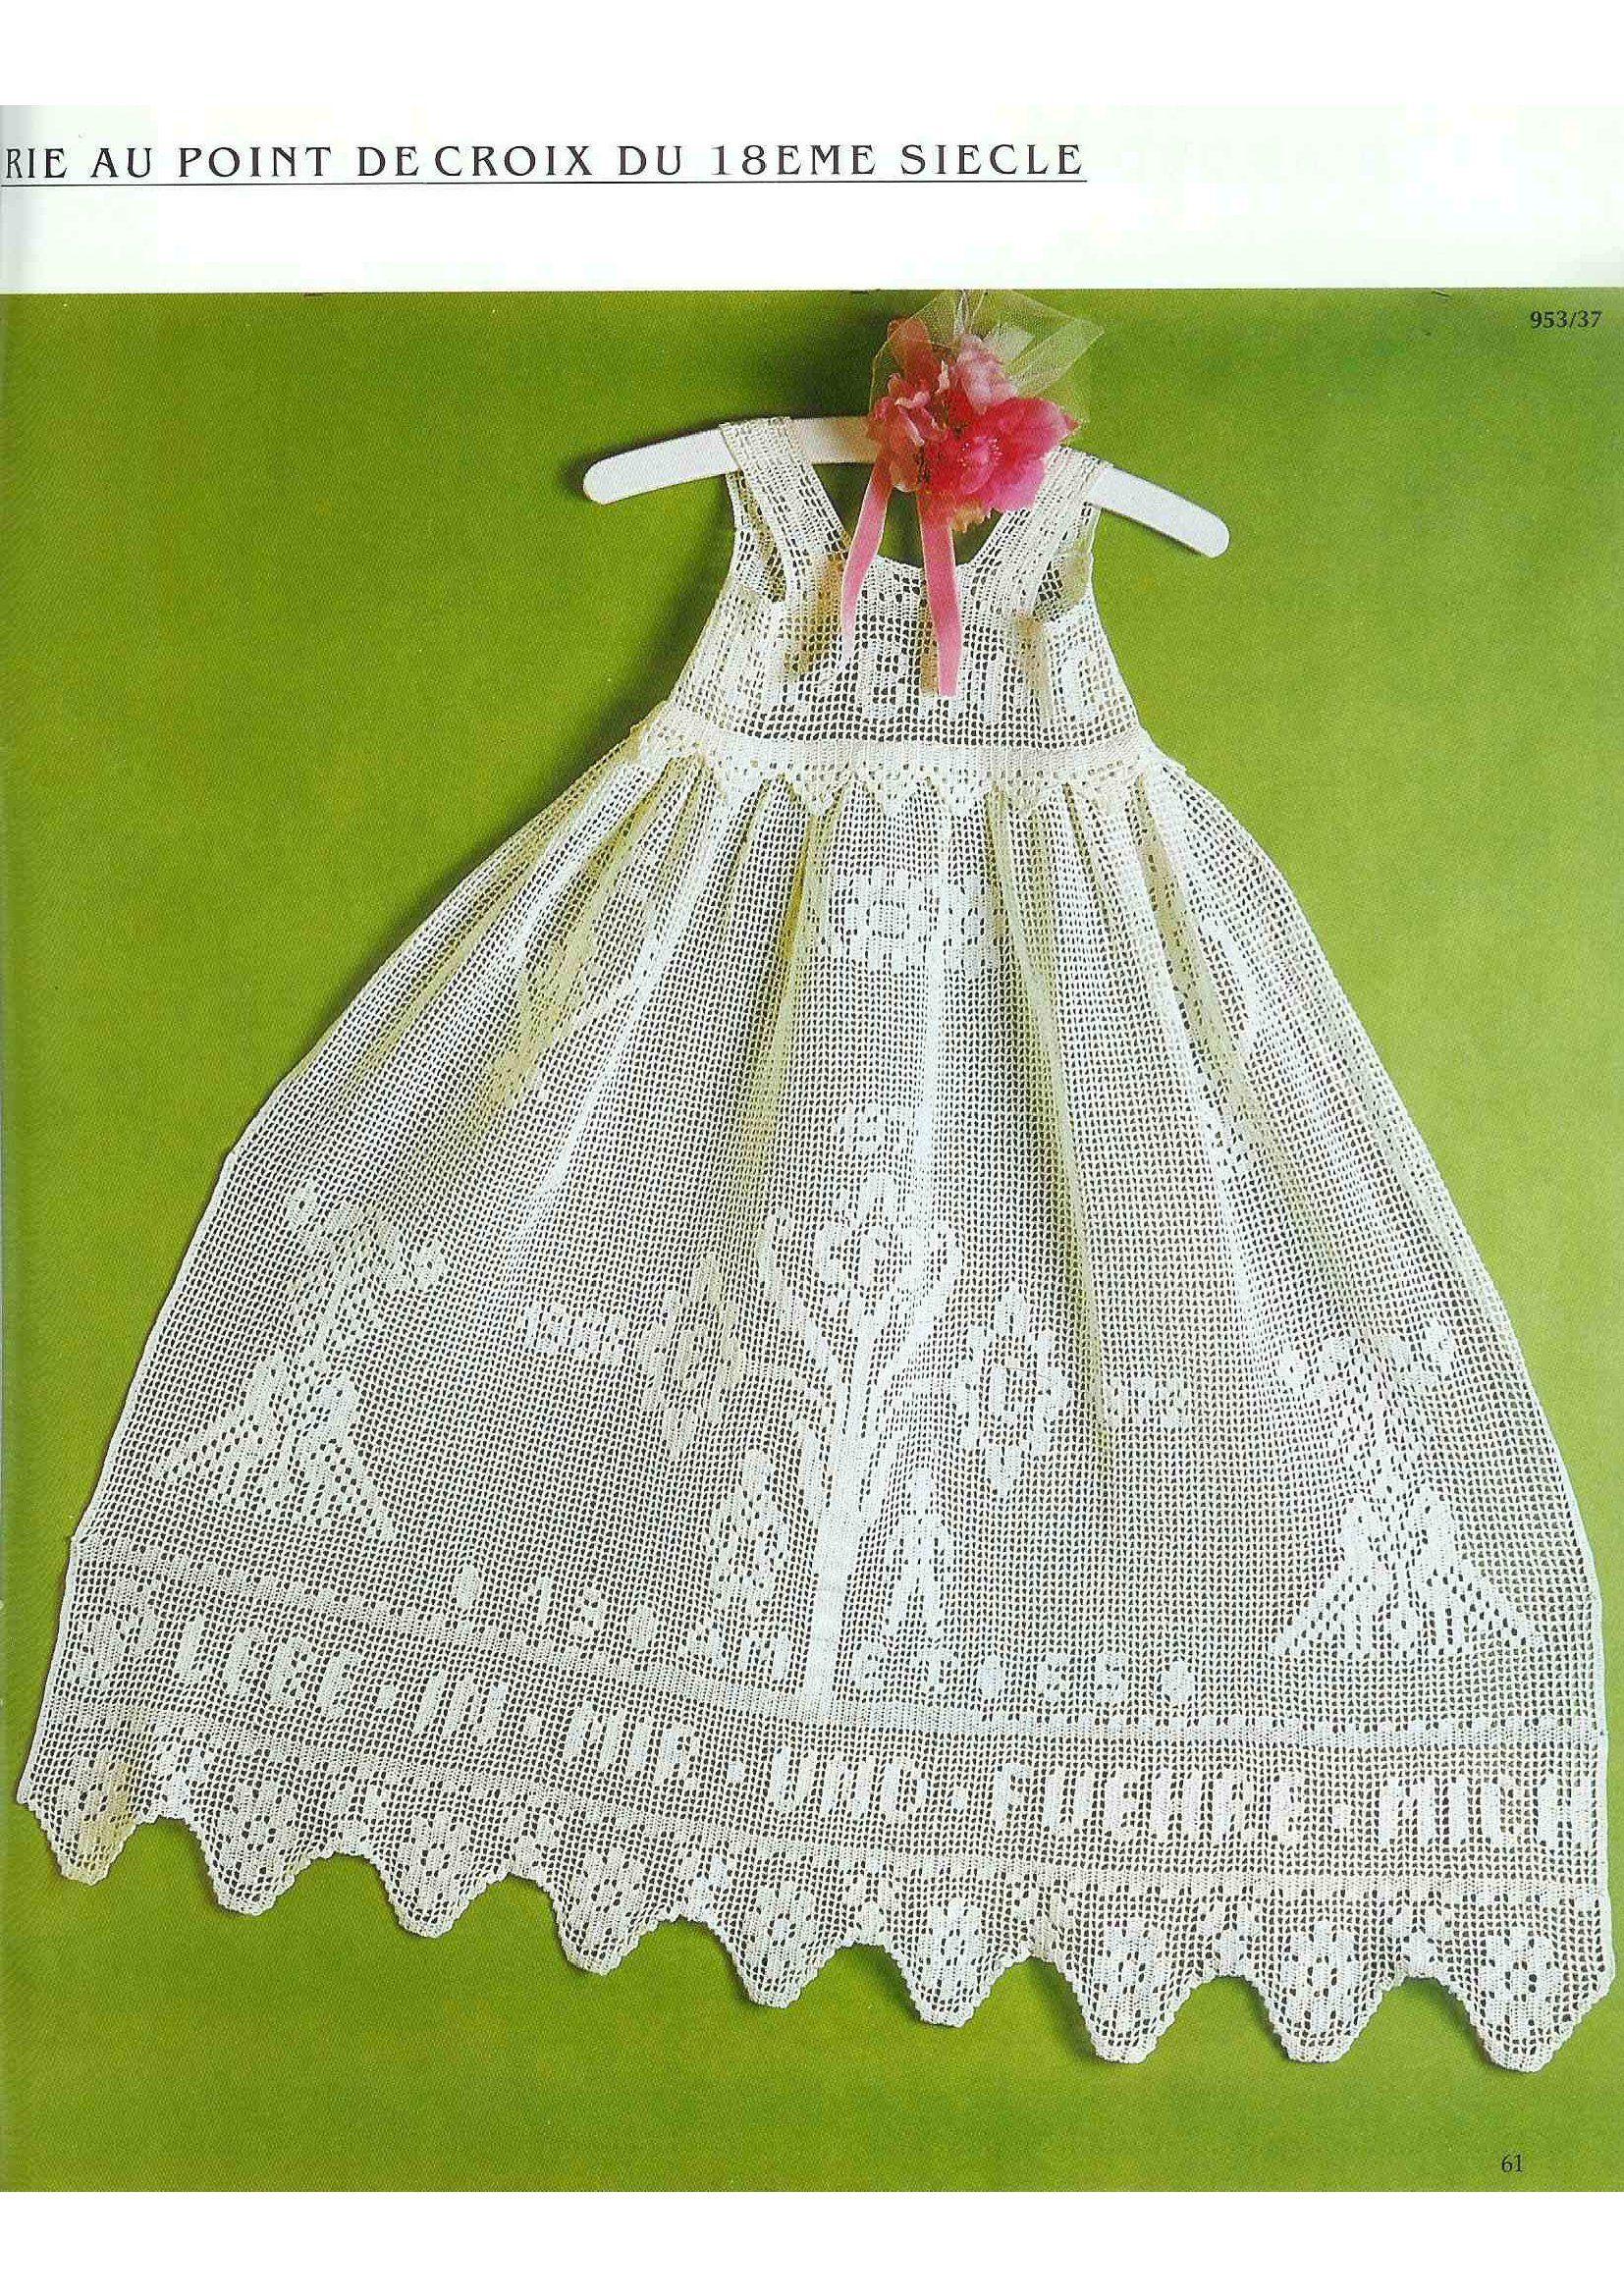 Full Filet Crochet Book Burda including crochet charts altar lace religious motives